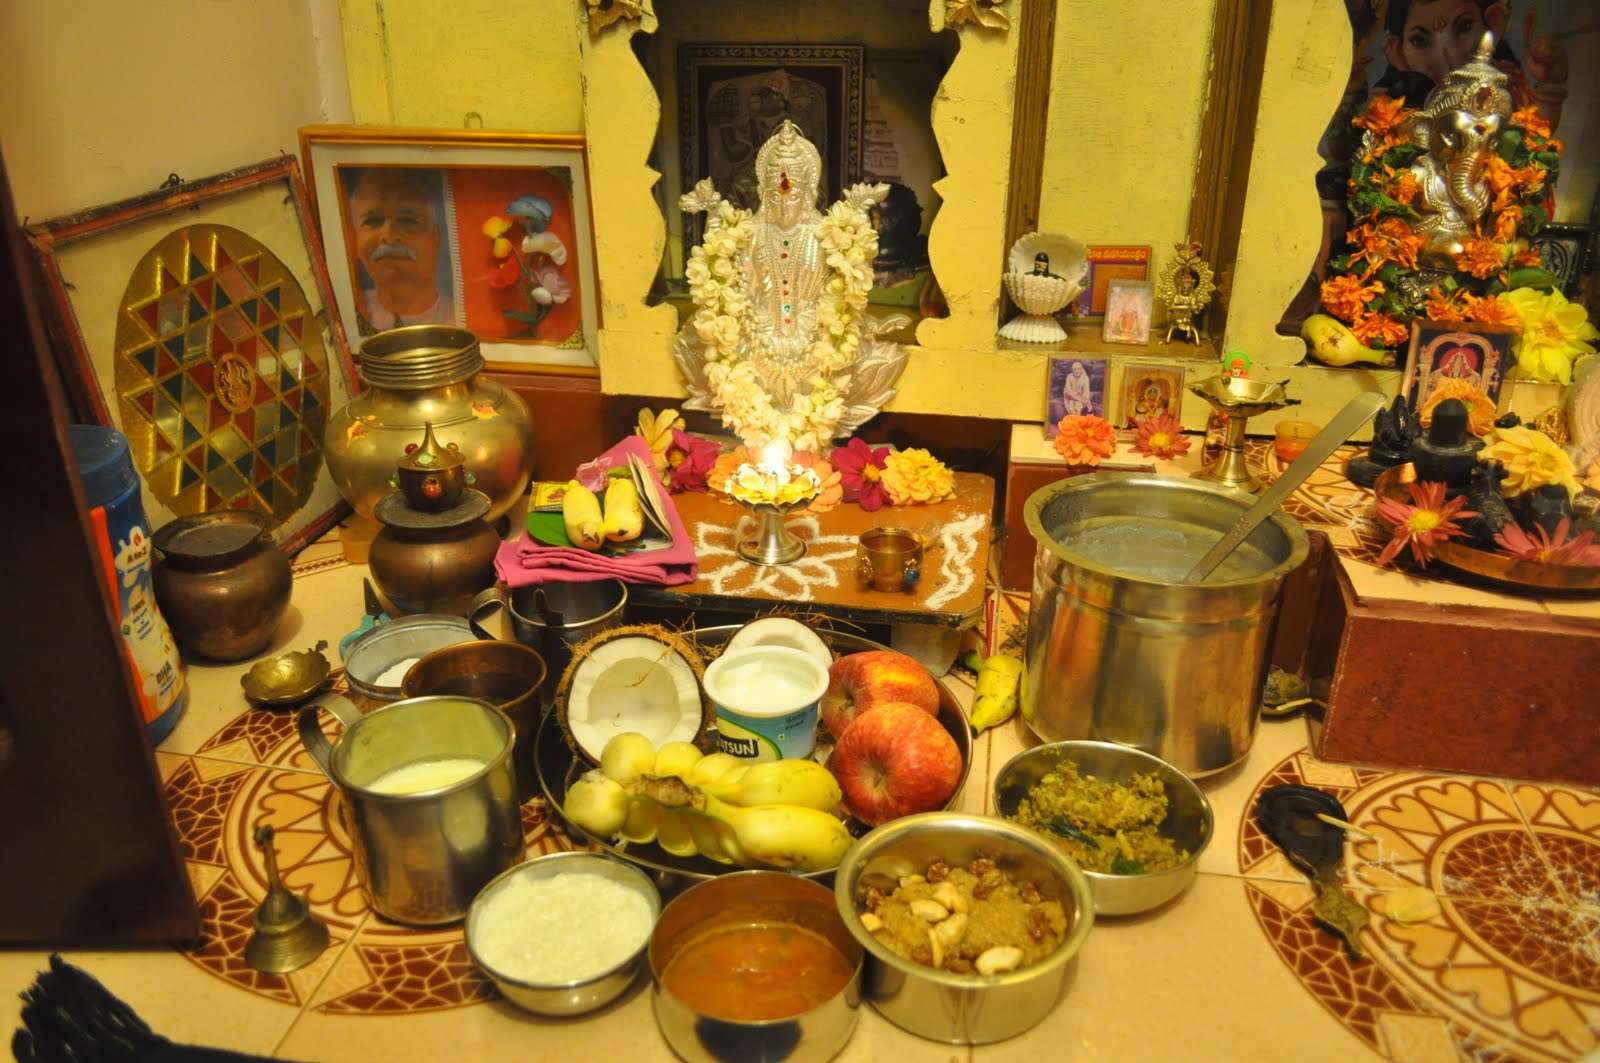 varalaxmi-vratham-spirituality-indian-womens-telmp